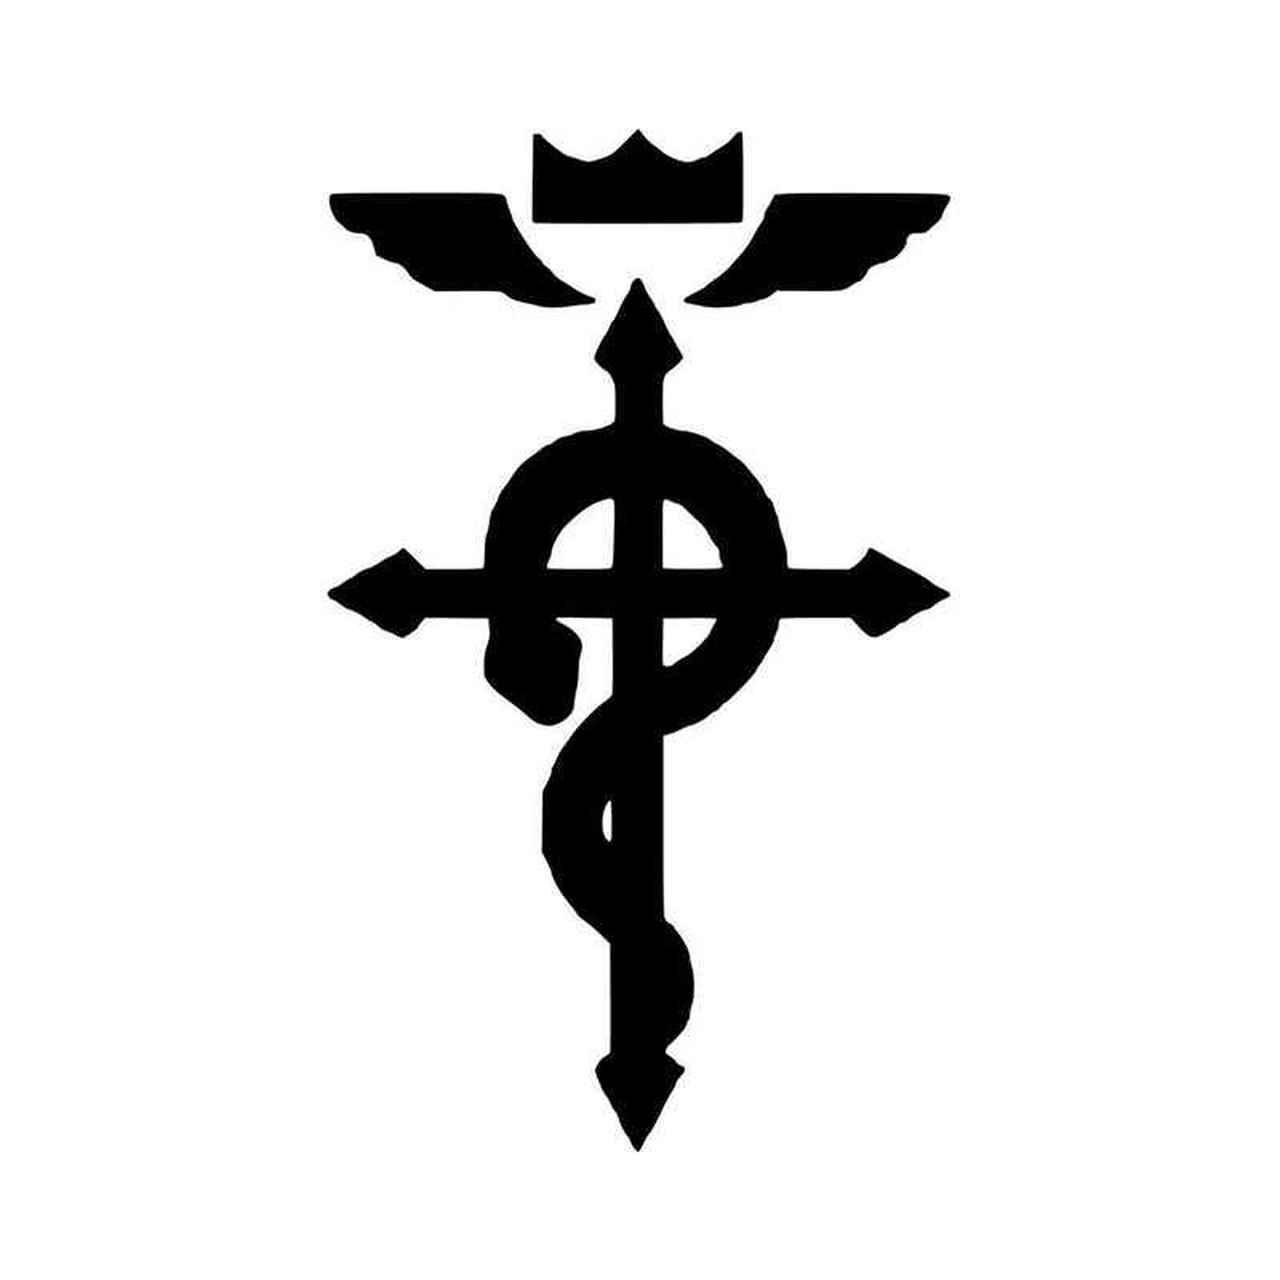 Fullmetal Alchemist Flamel Logo Vinyl Decal Sticker.